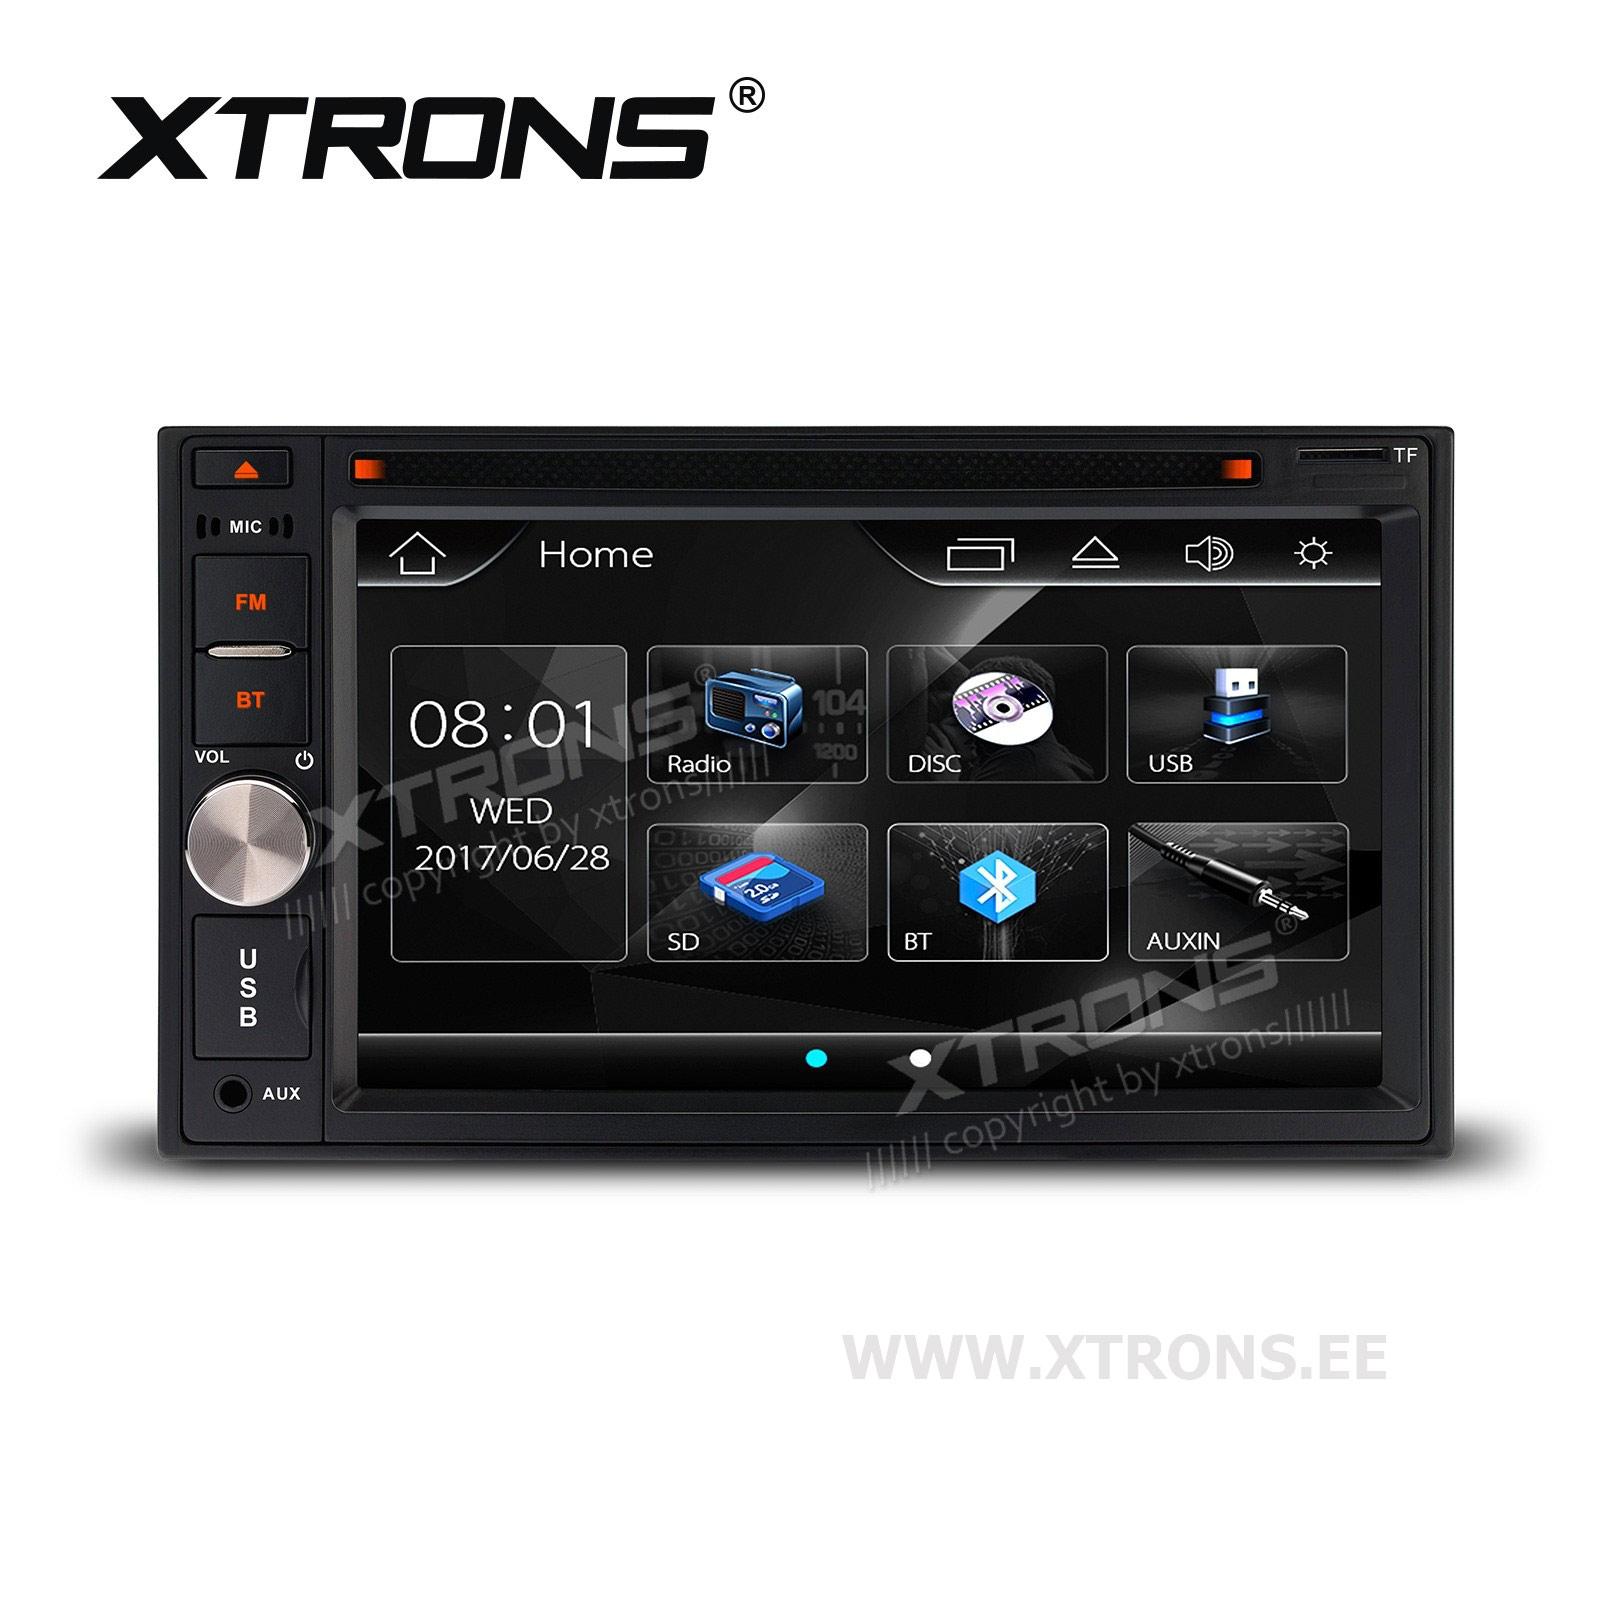 XTRONS TD623